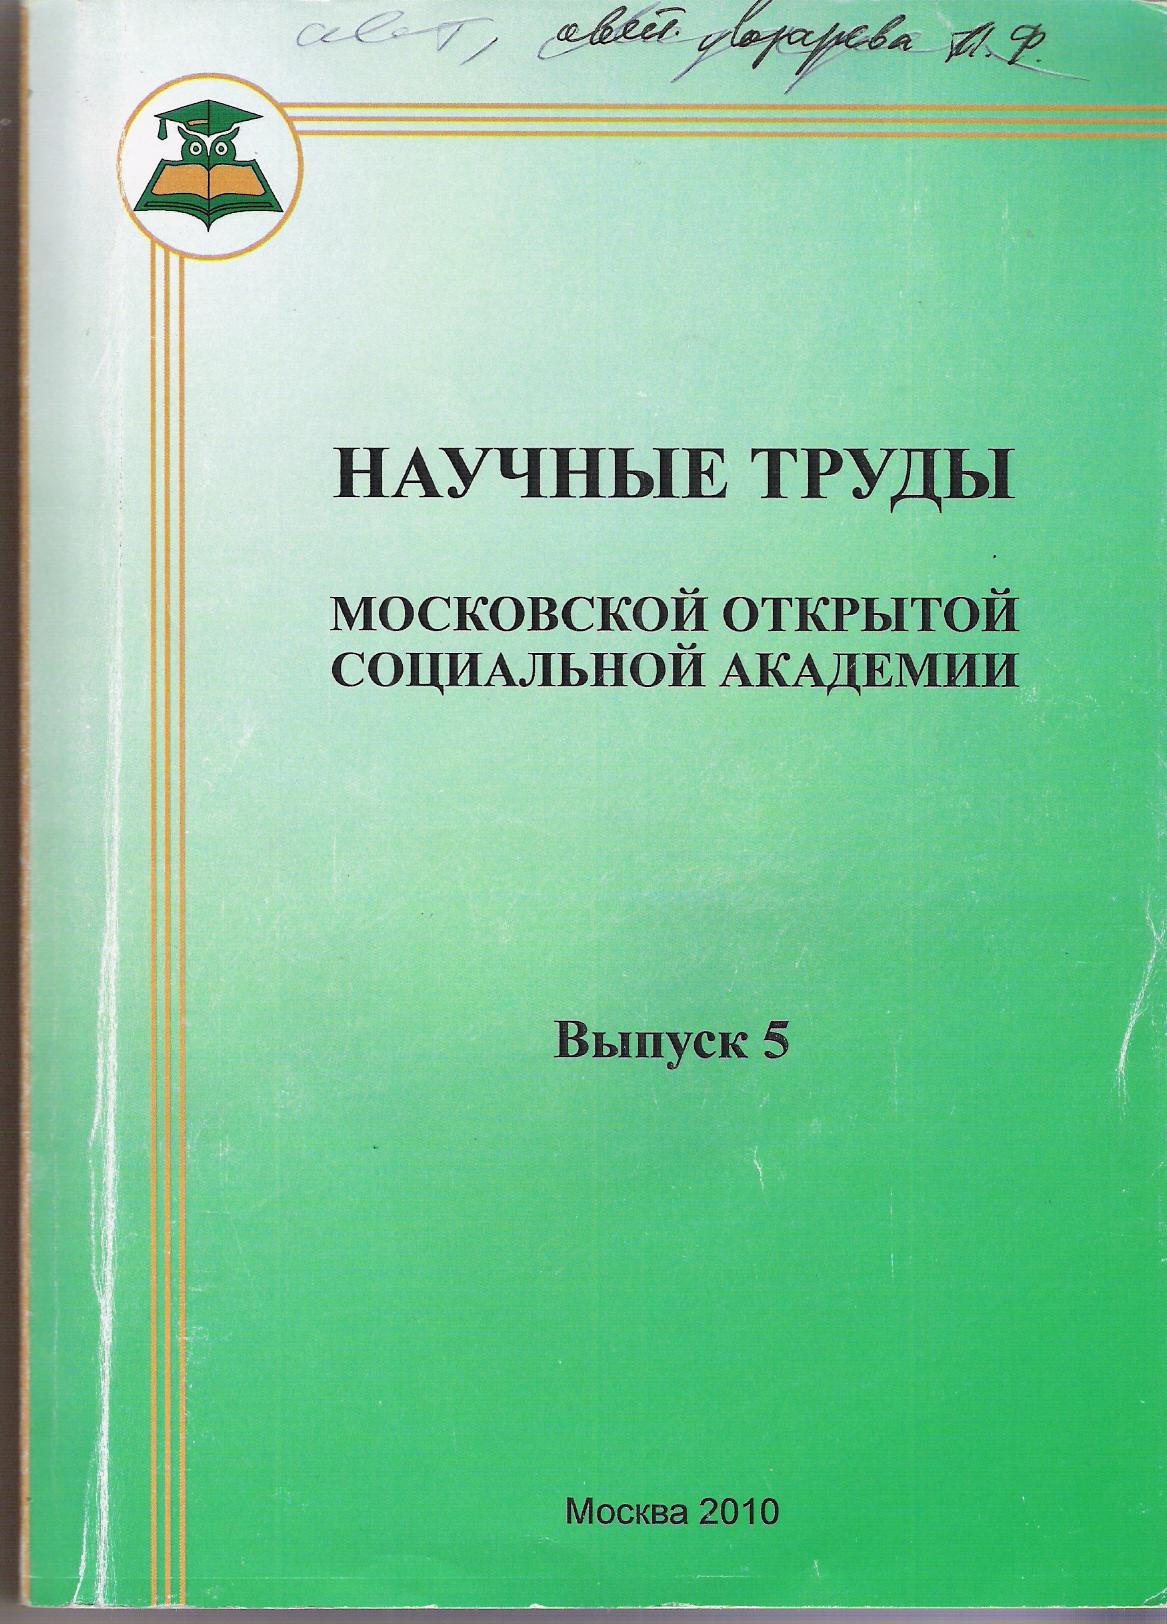 book друзям и любителям астрономии 2009